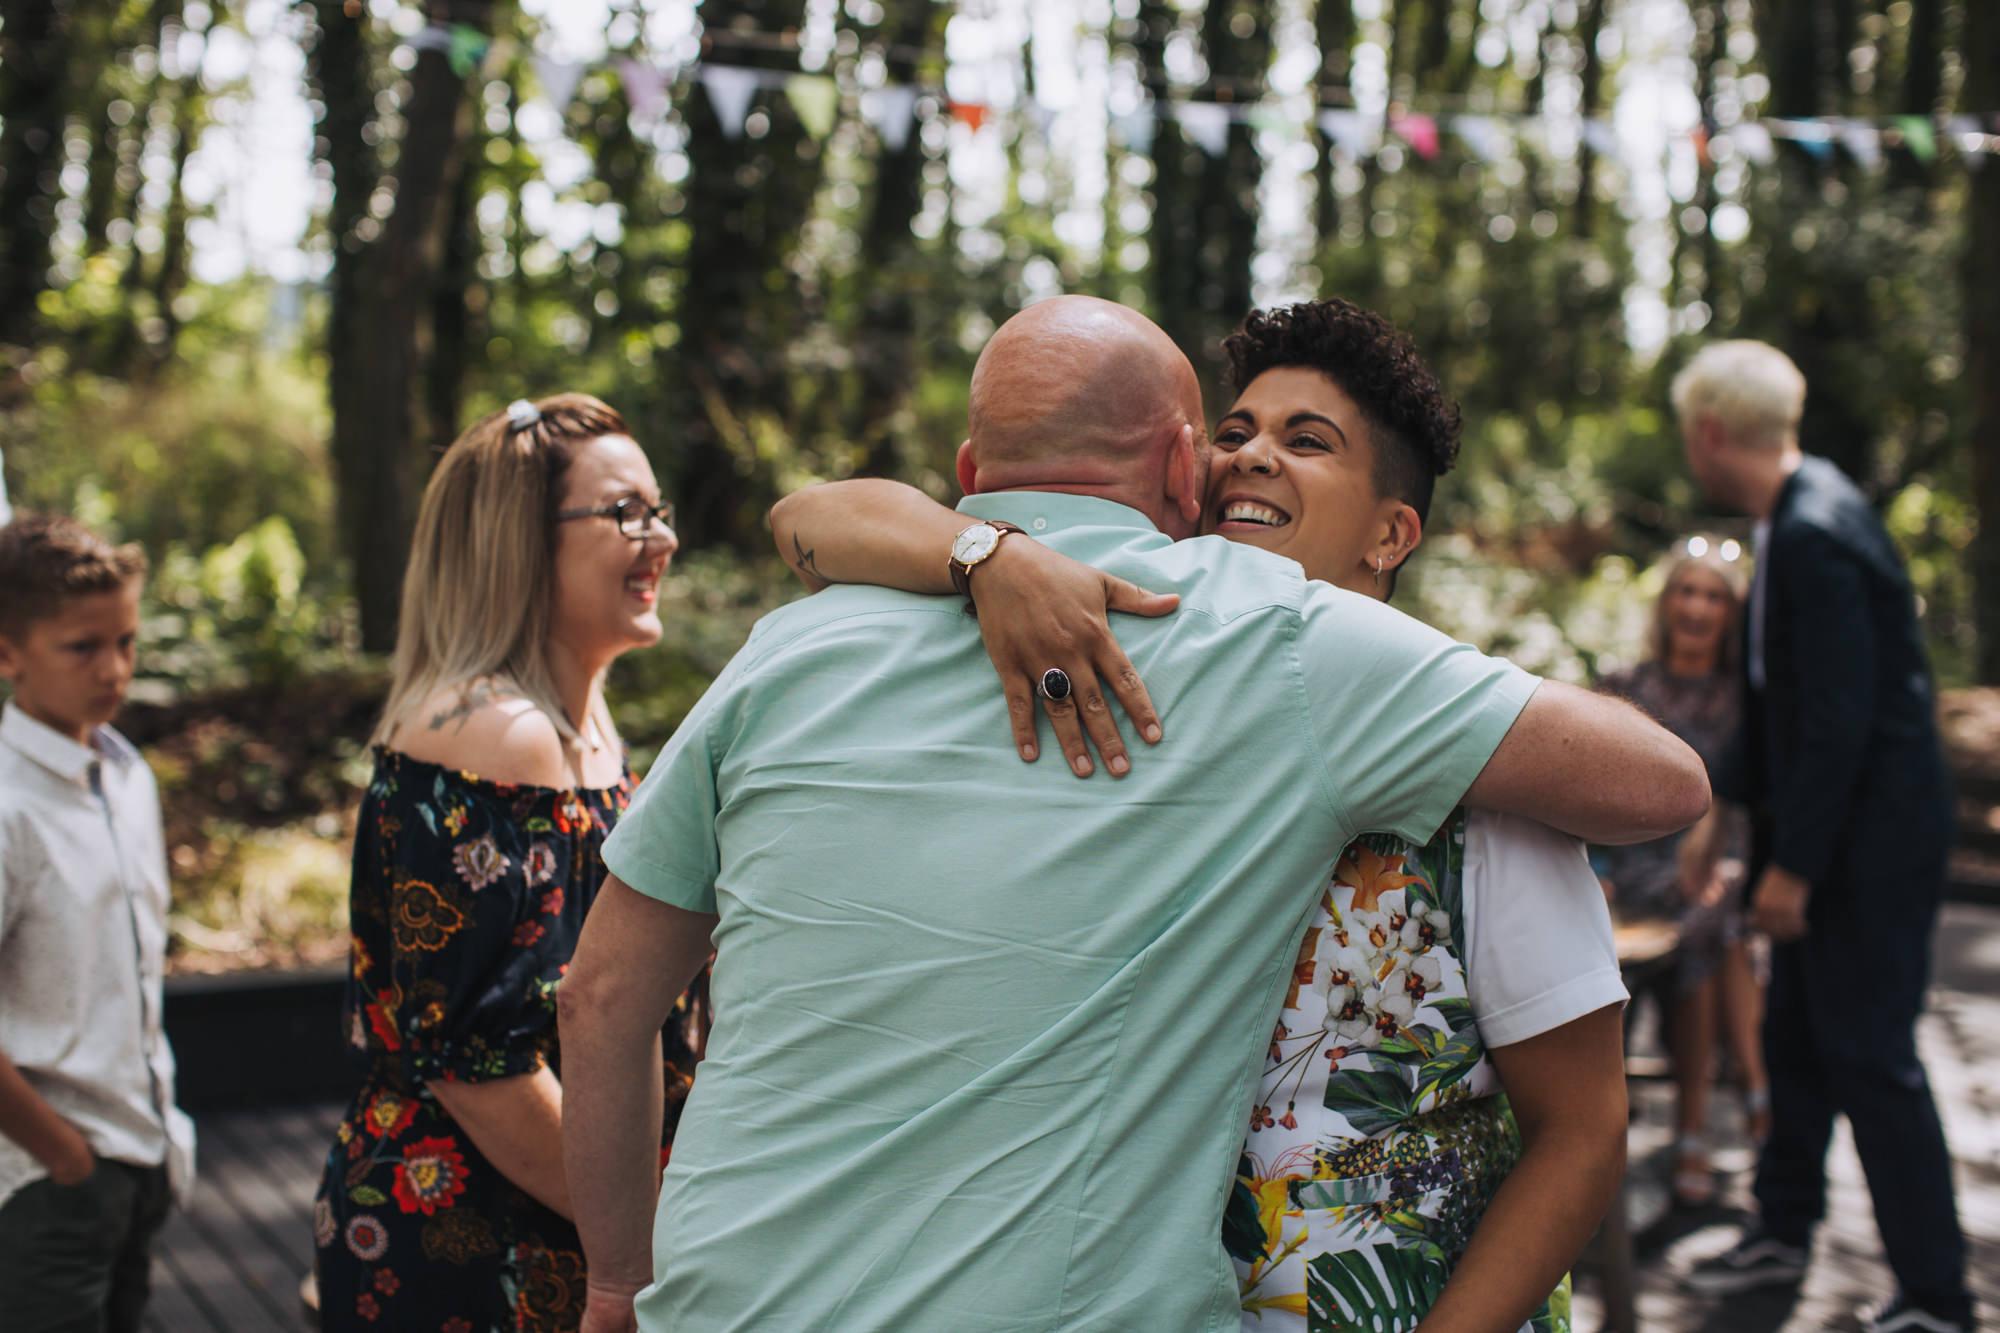 applewood wedding photographer leeds, yorkshire16.jpg